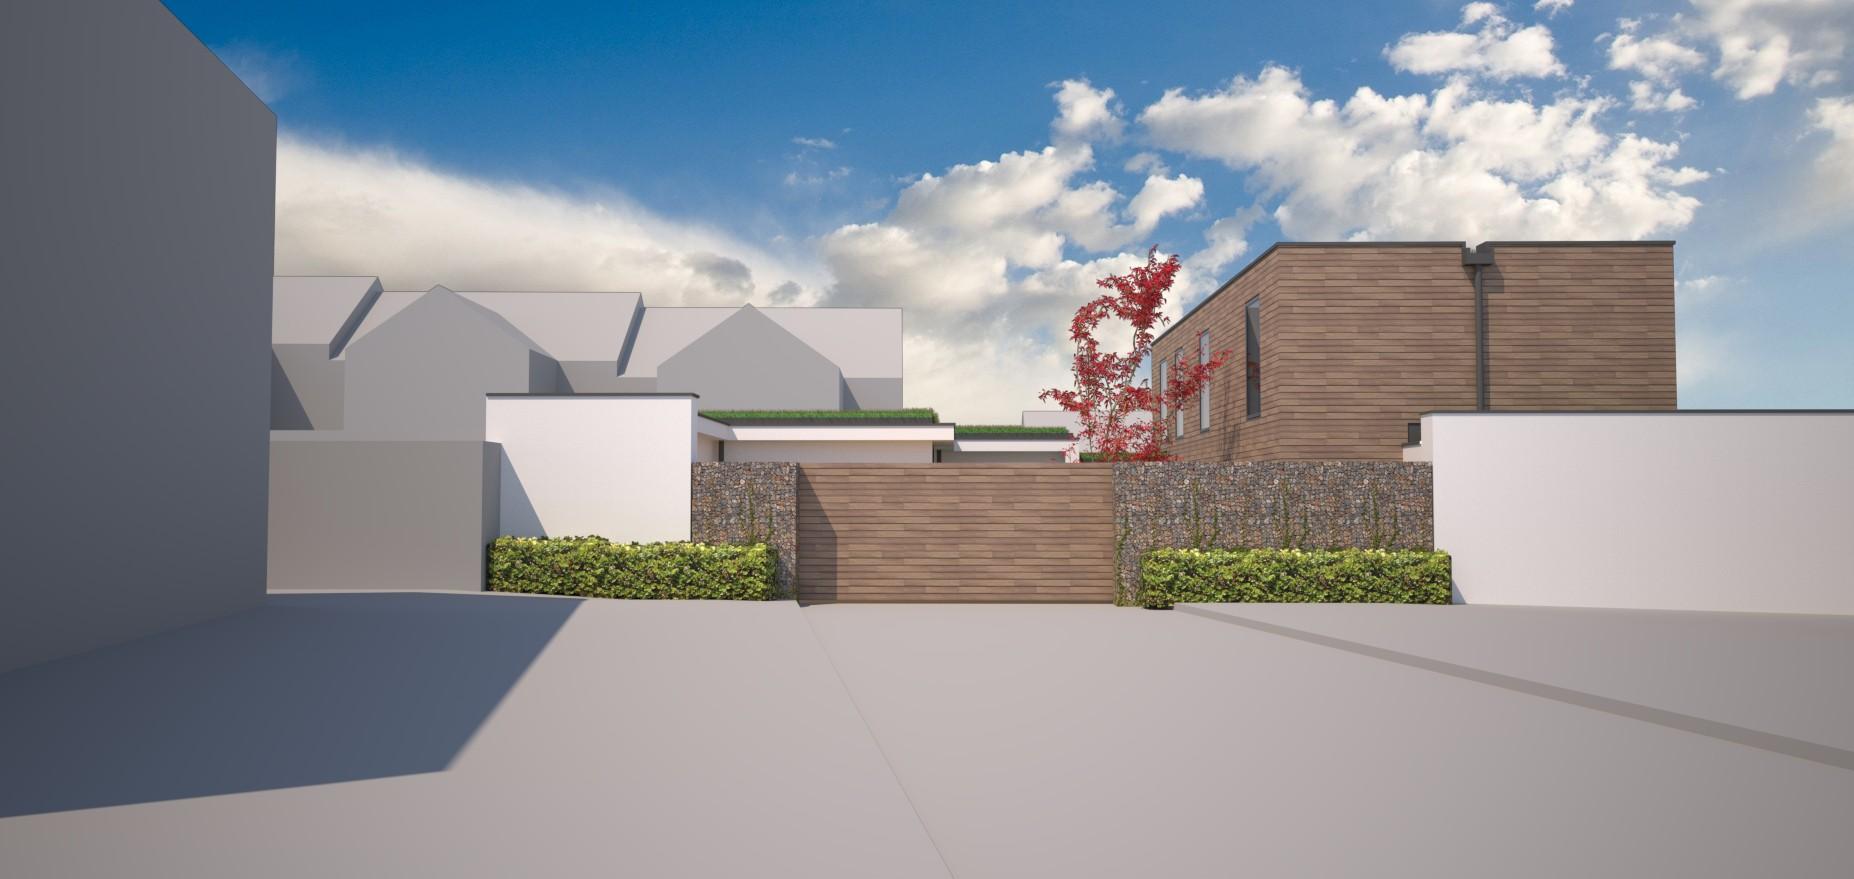 Courtyard-house-streetView